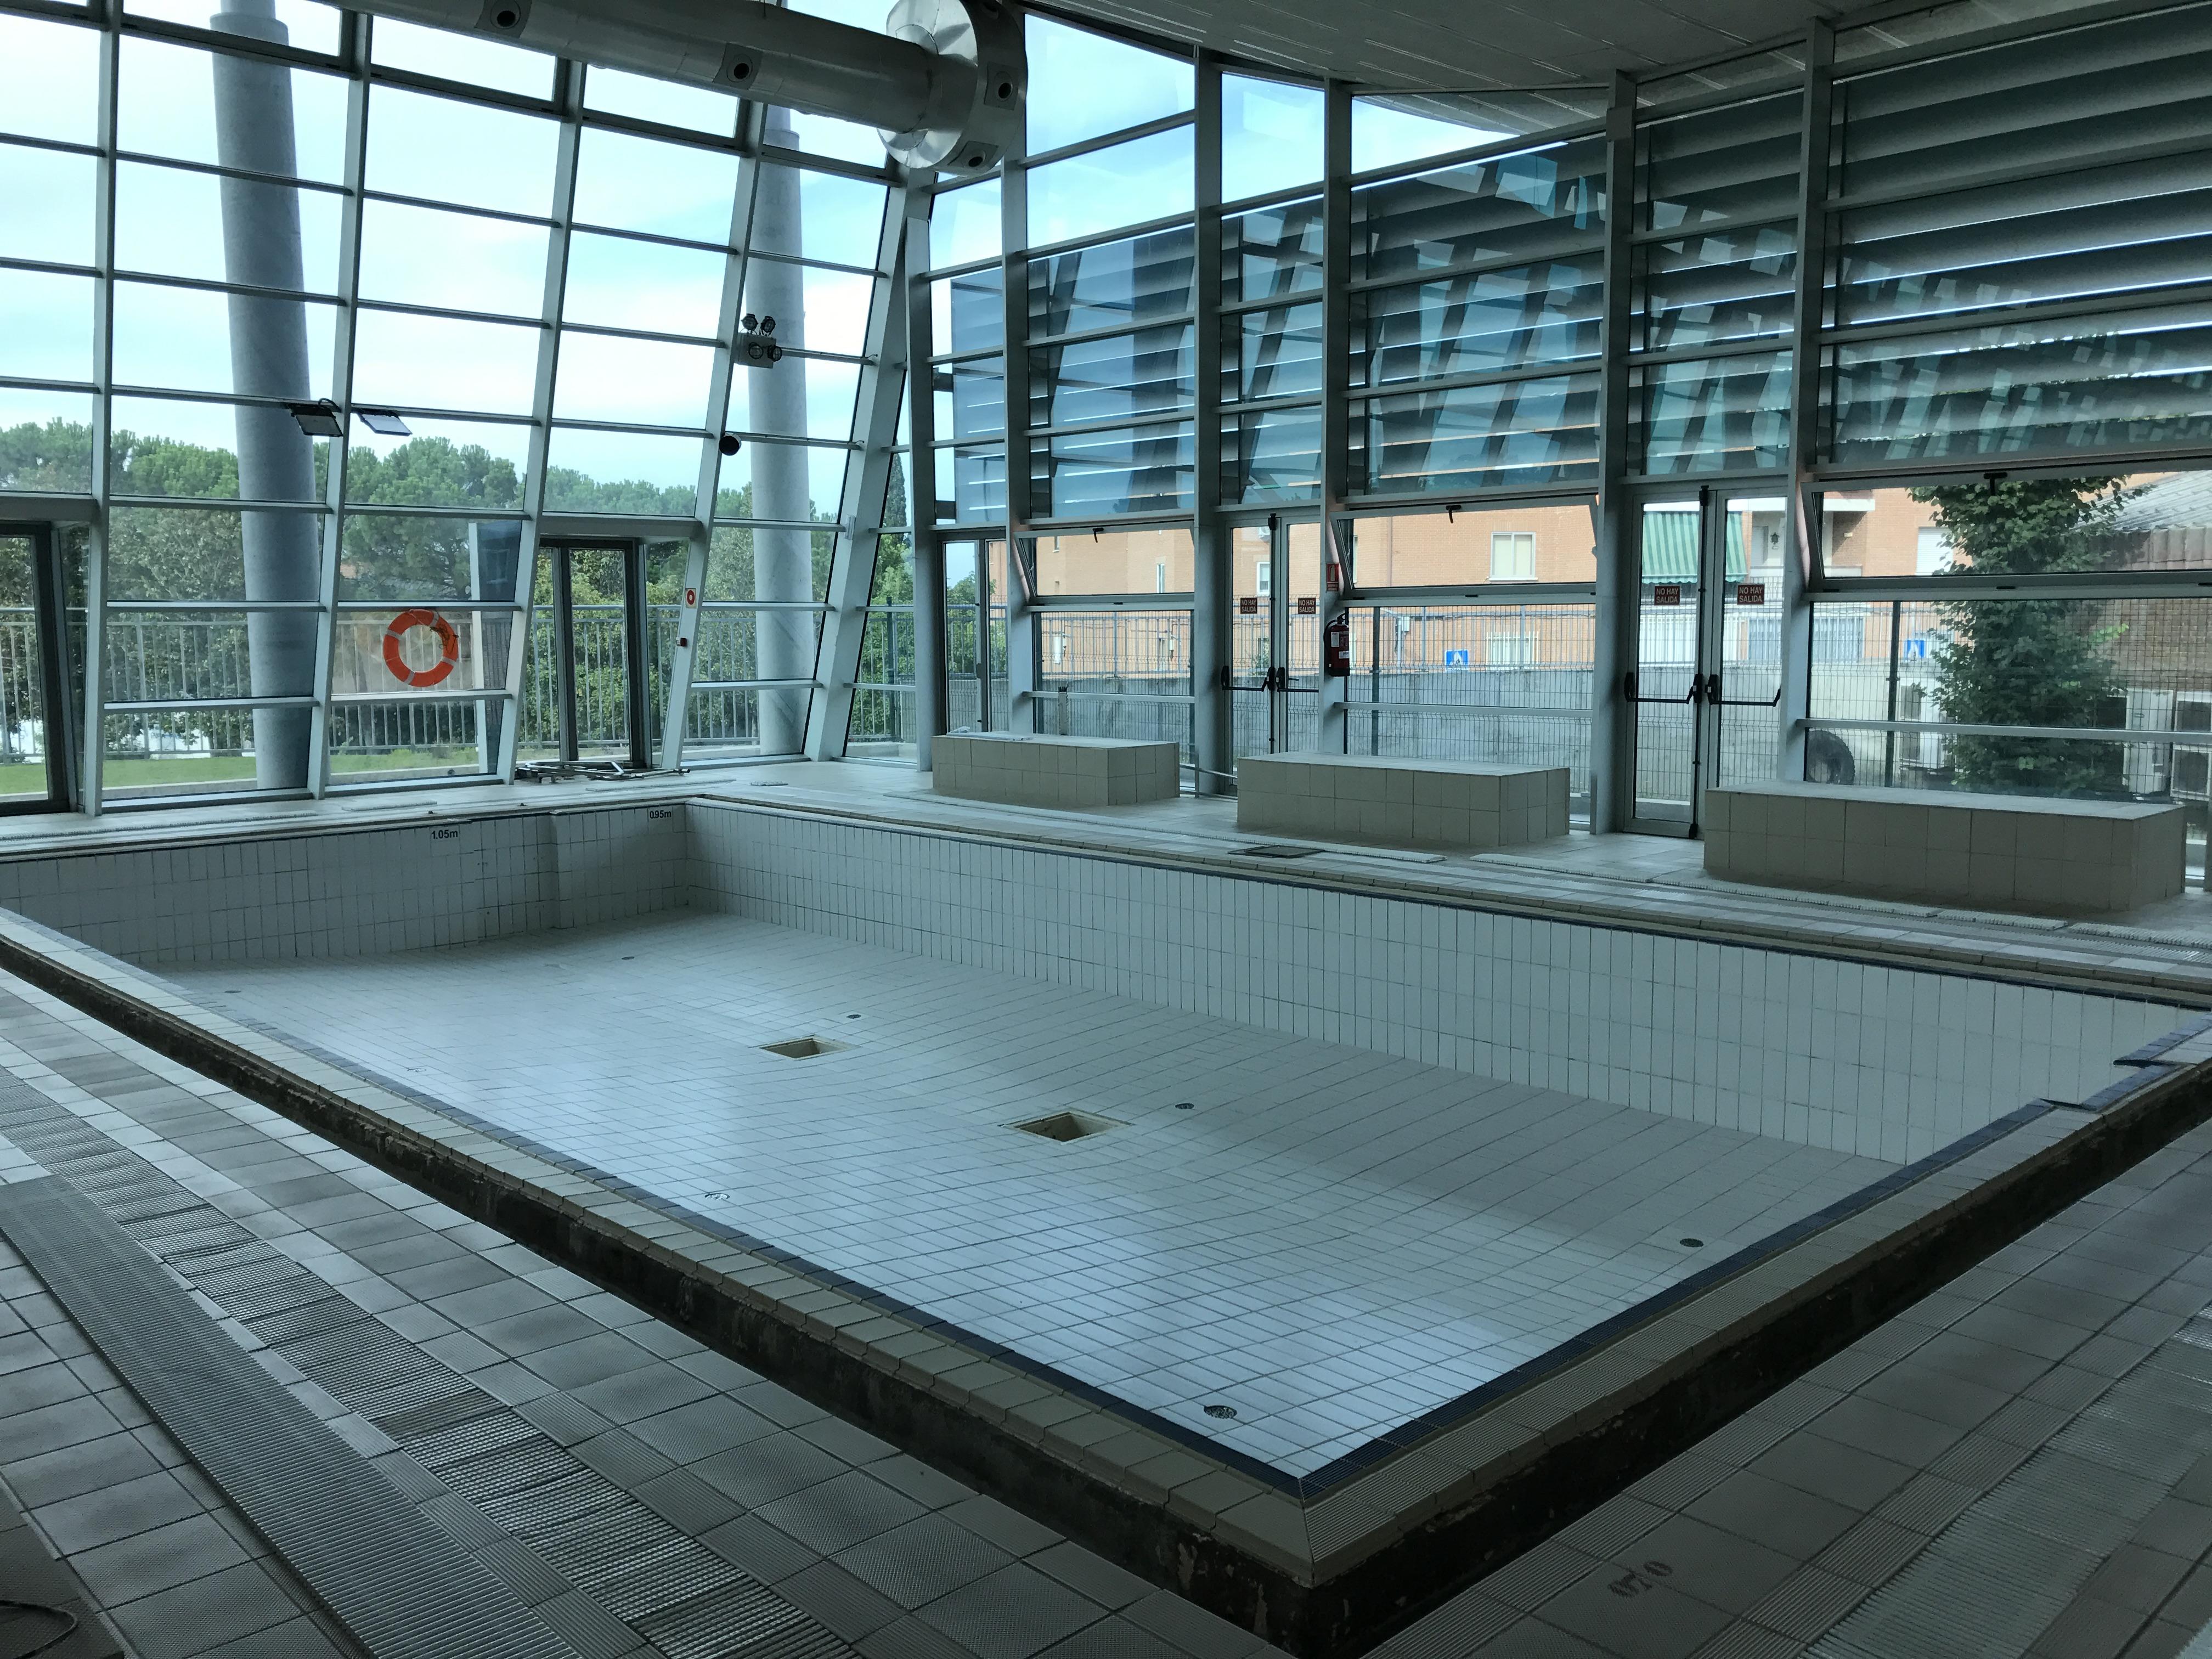 Parada t cnica para mejora de la piscina cubierta for Piscinas soto